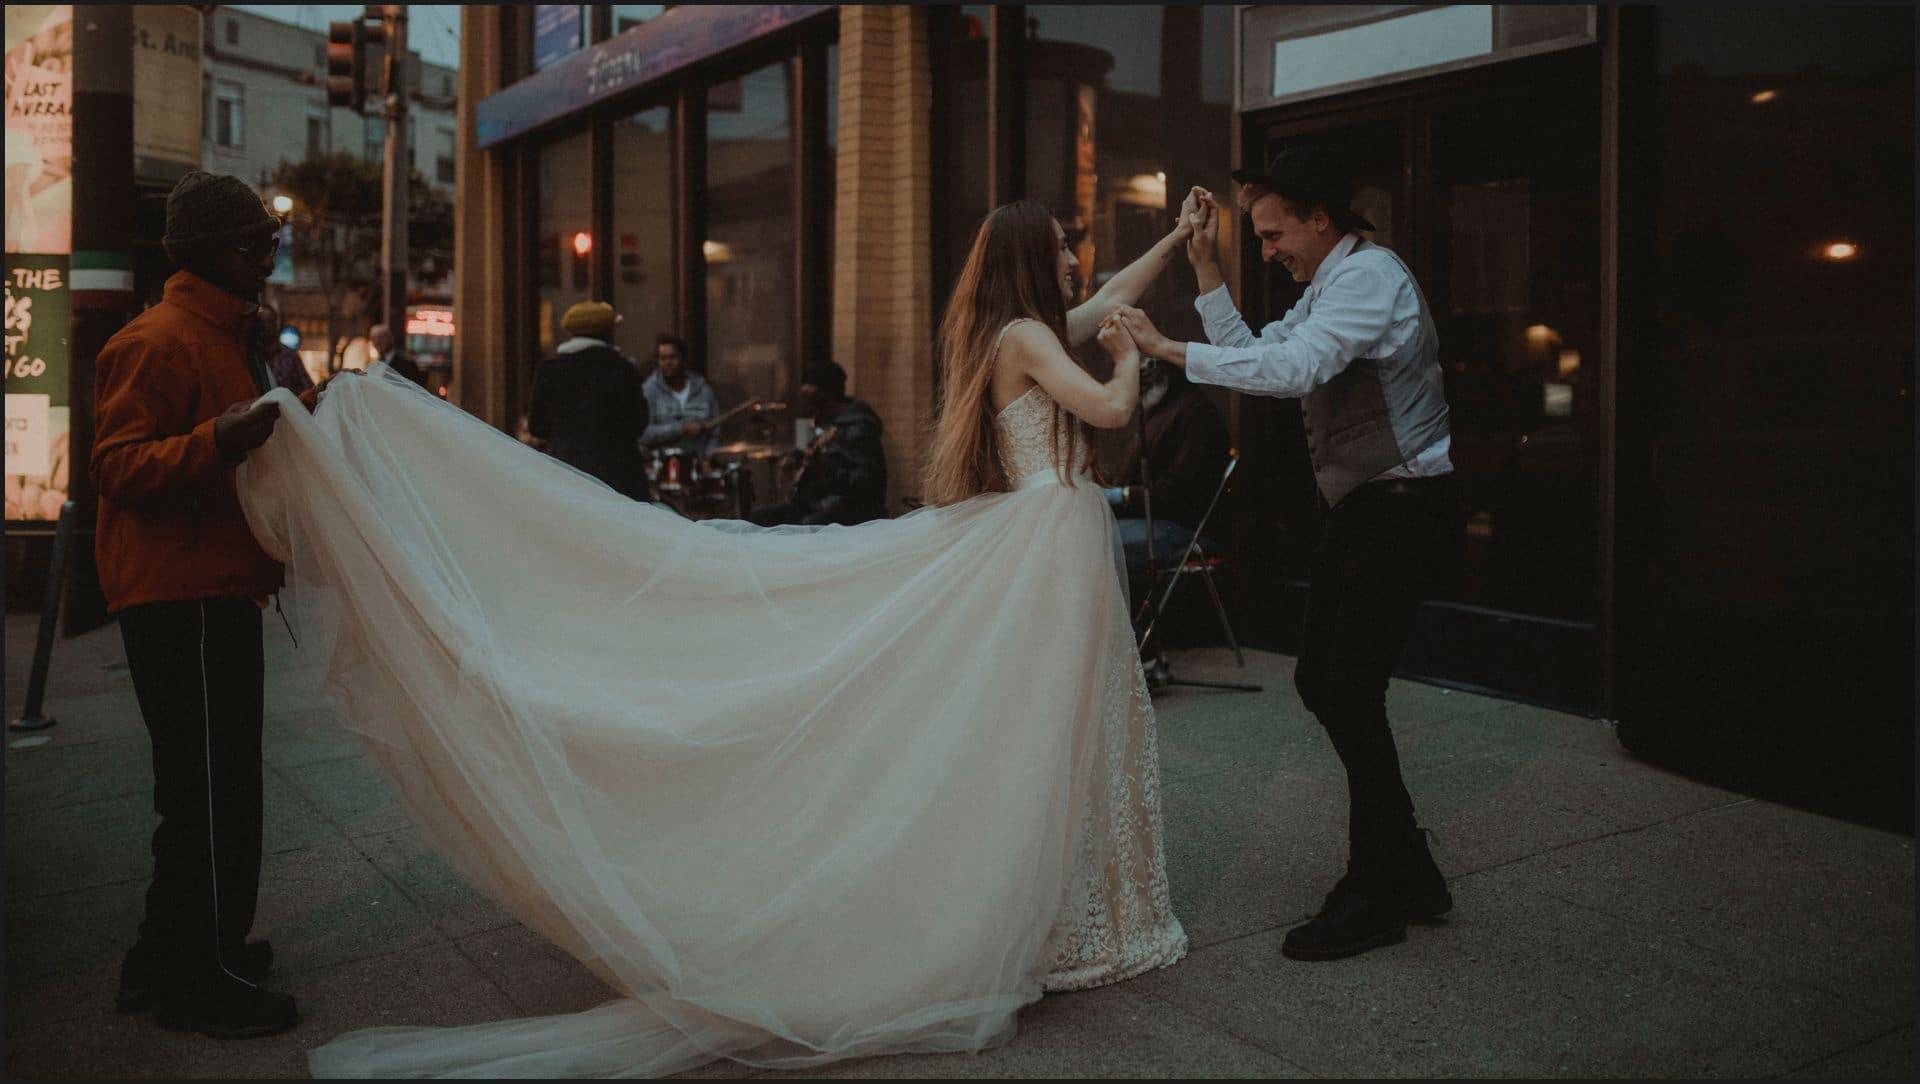 san francisco, california, elopement wedding, dancing, groom, bride